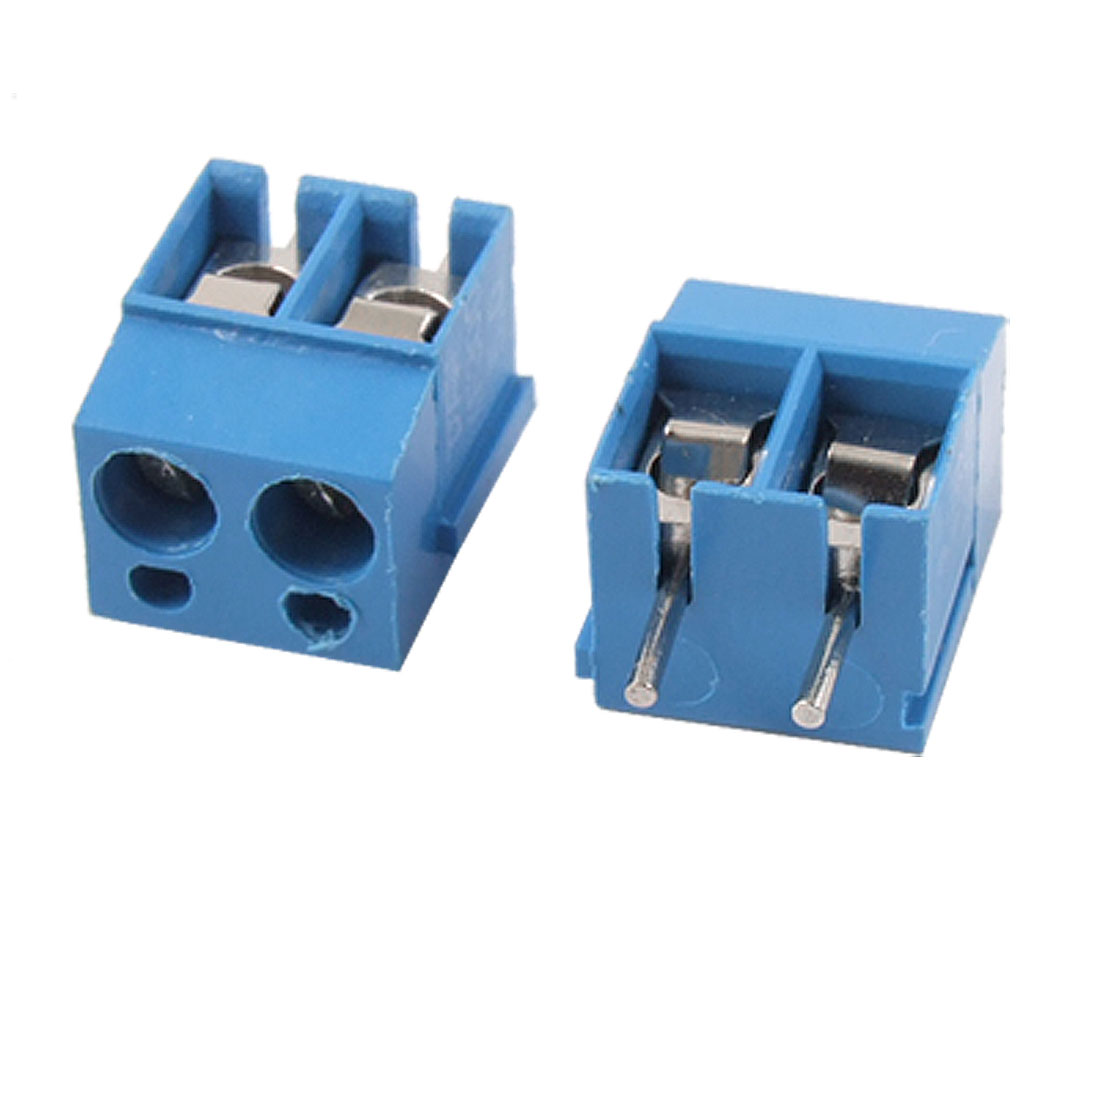 4 Pcs 2 Terminals 2 Way PCB Screw Teminal Blocks 5mm Pitch AC 300V 16A